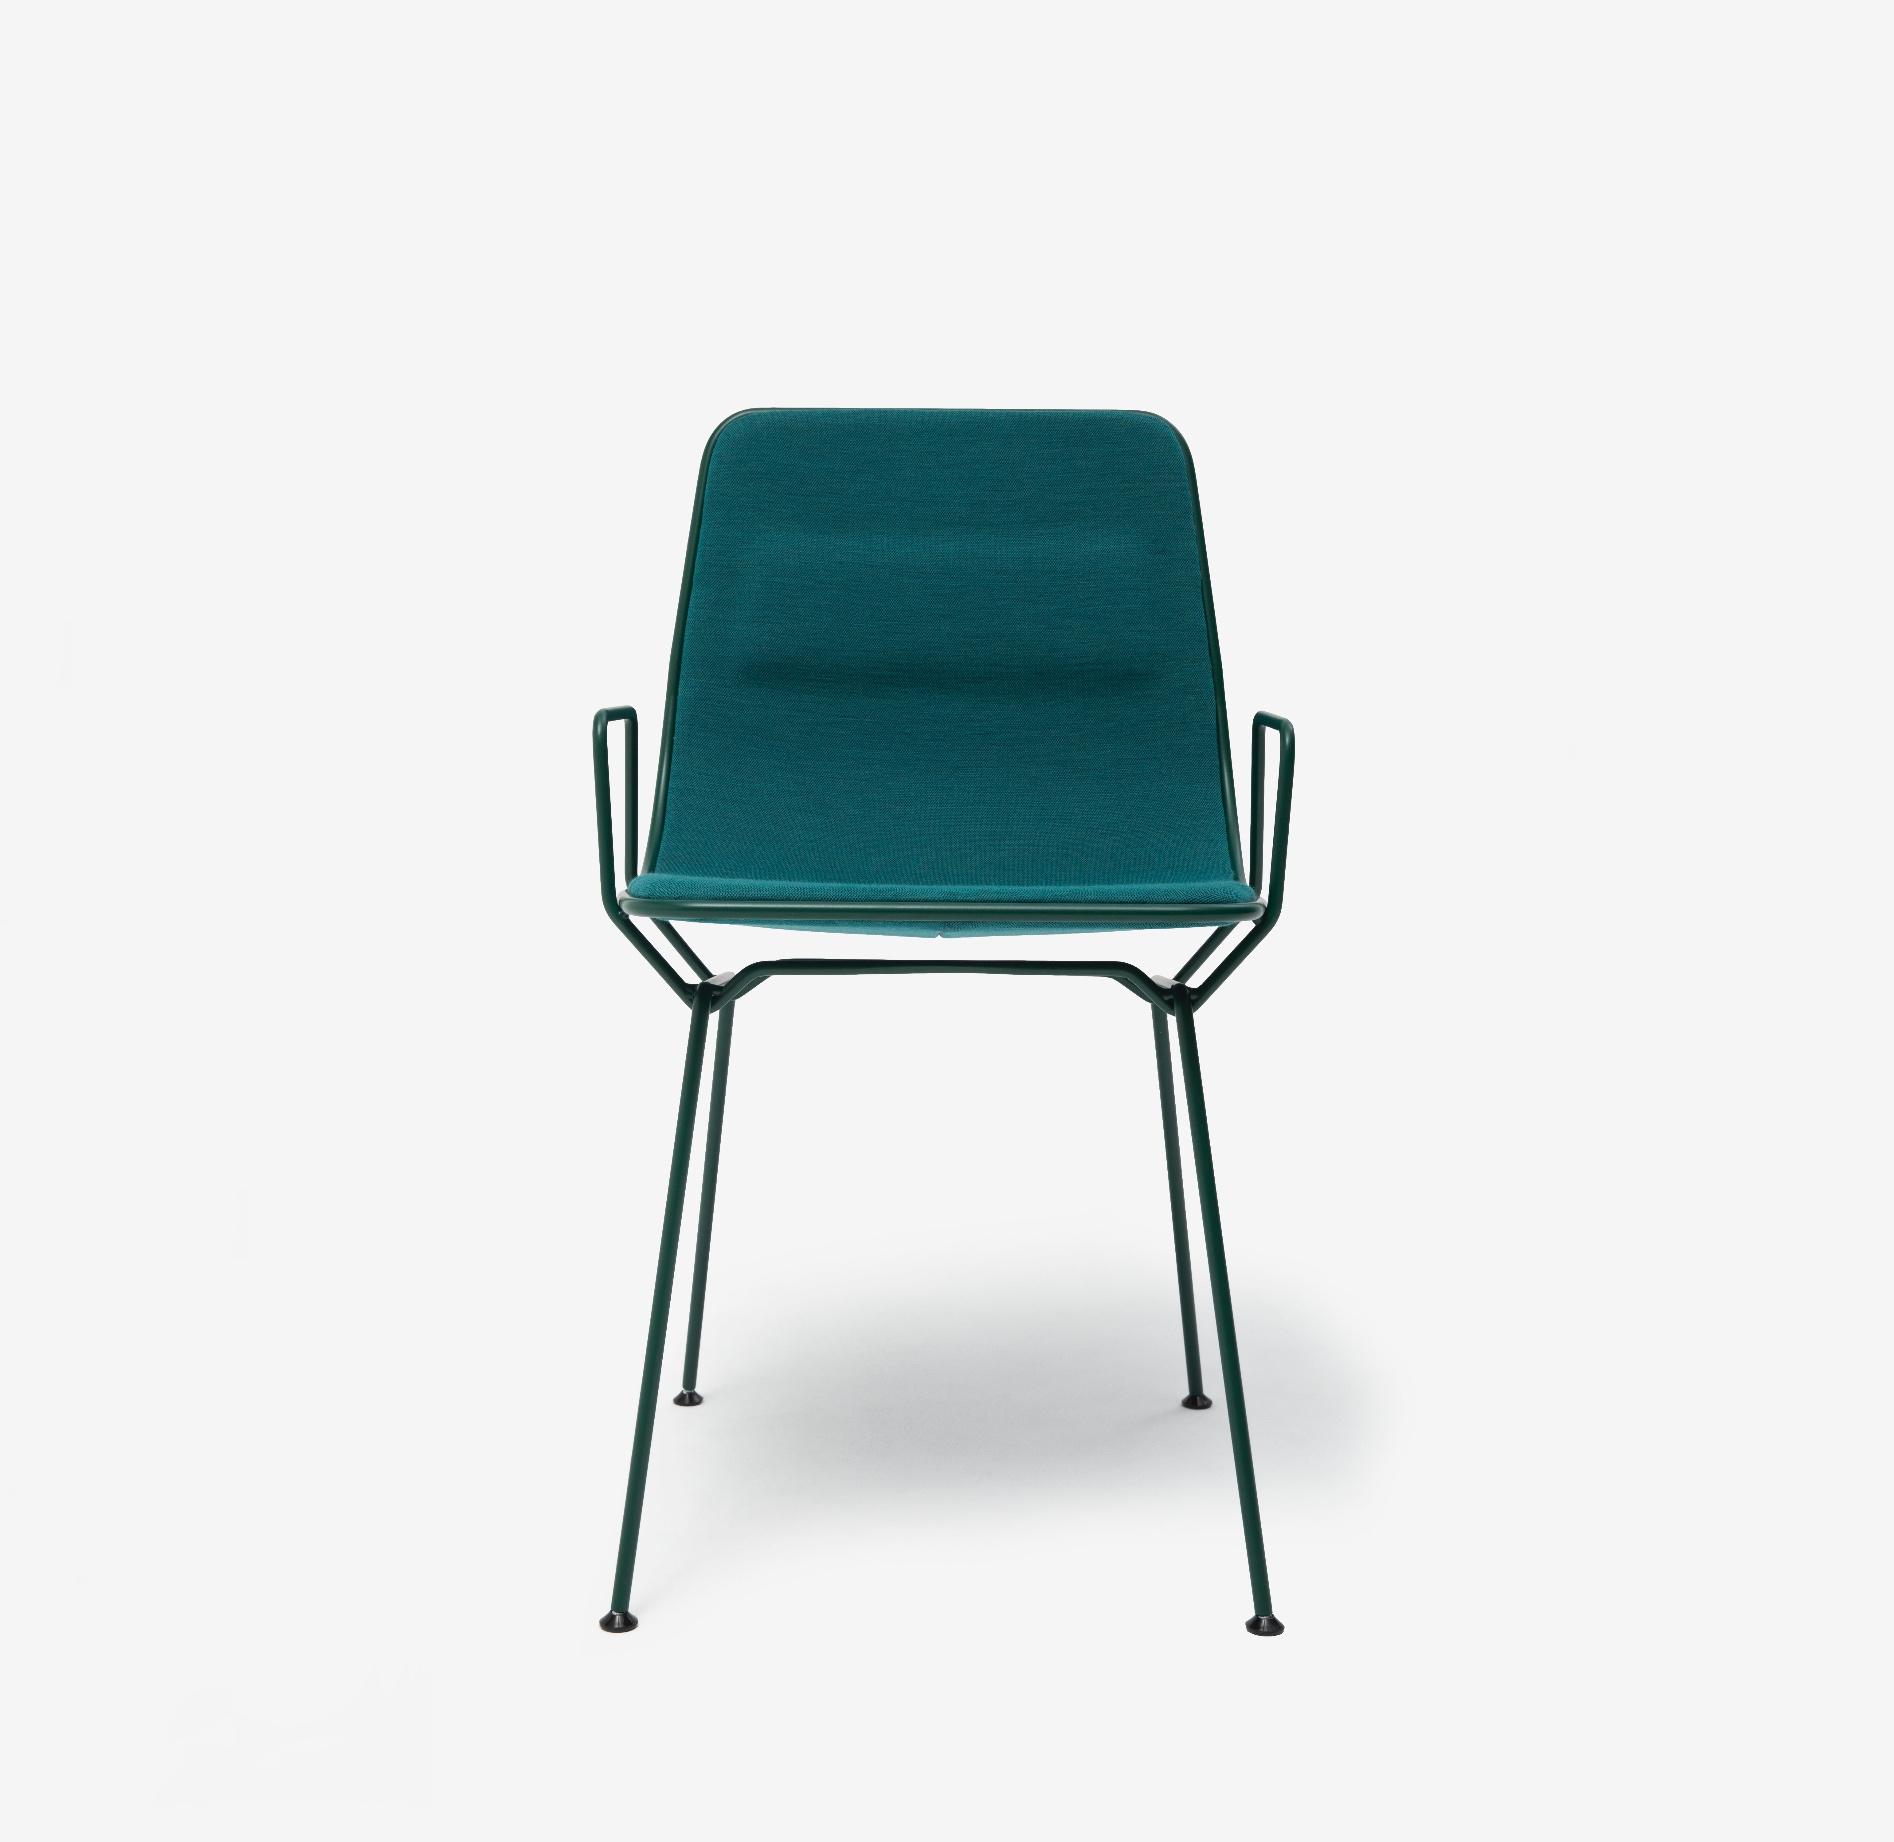 moko chair_handle_5_more background-5